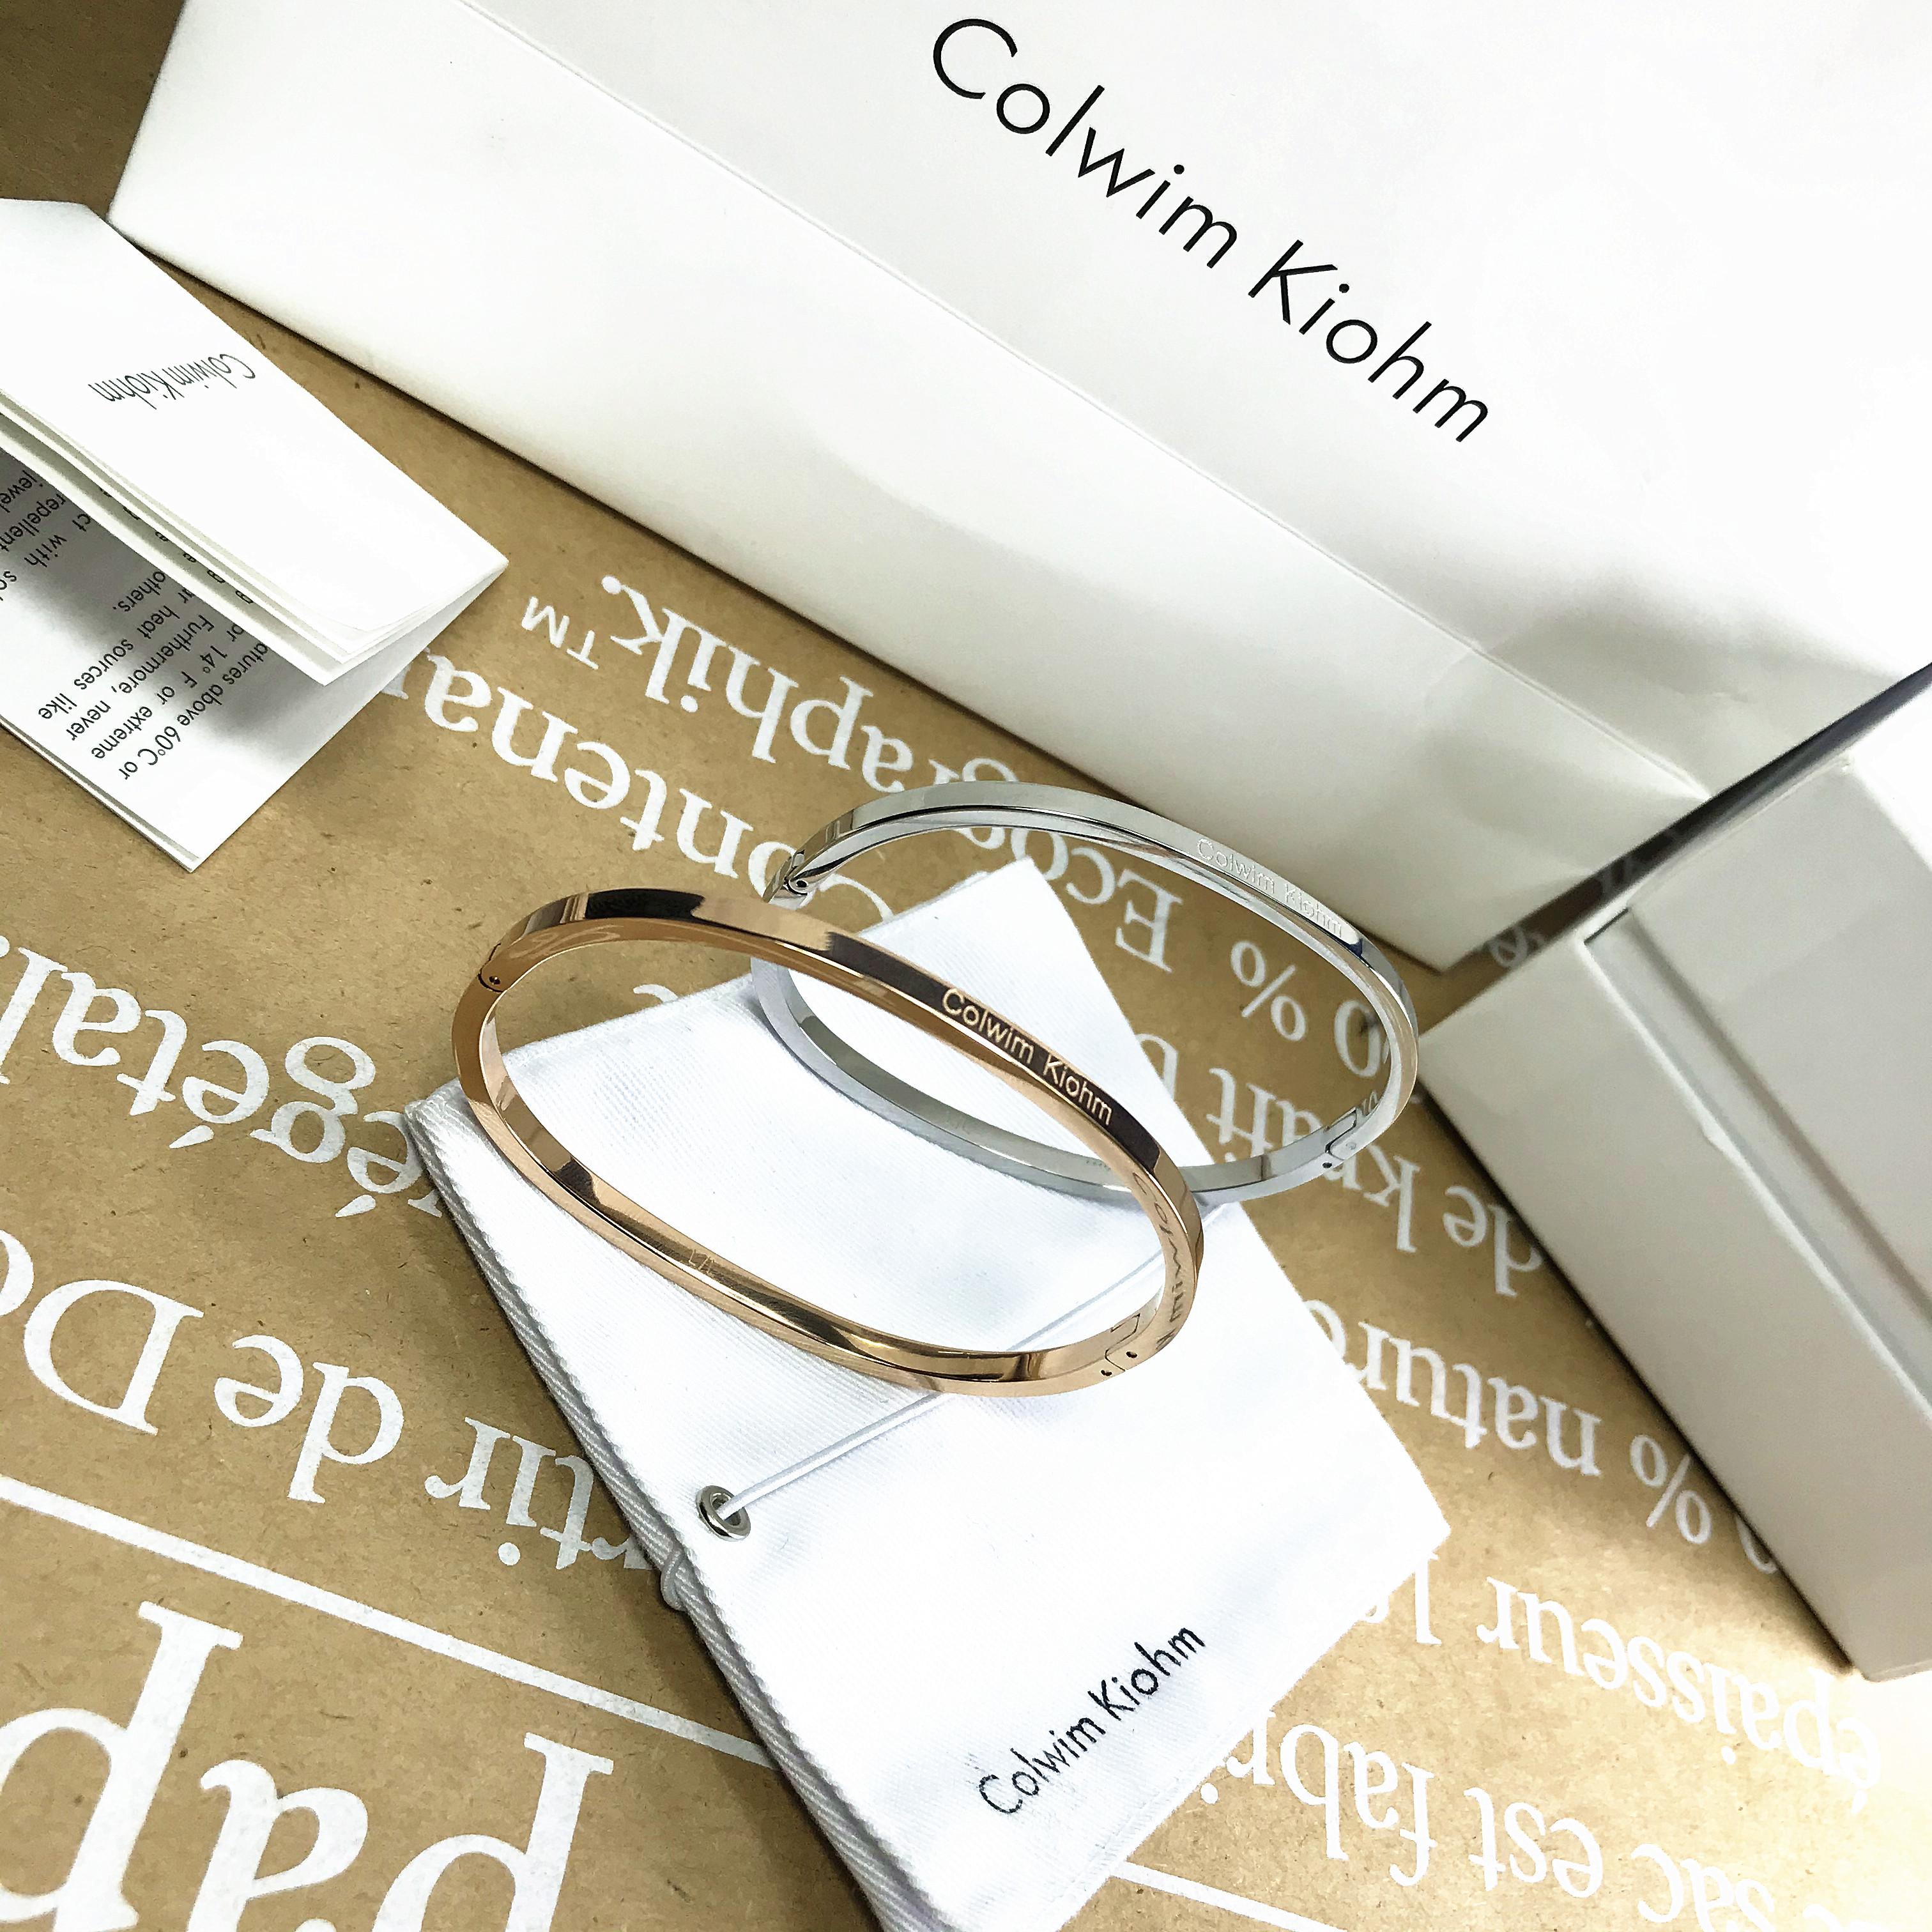 Colwim Kiohm简约手链小ck男女情侣款手镯时尚手环情人节学生礼物图片